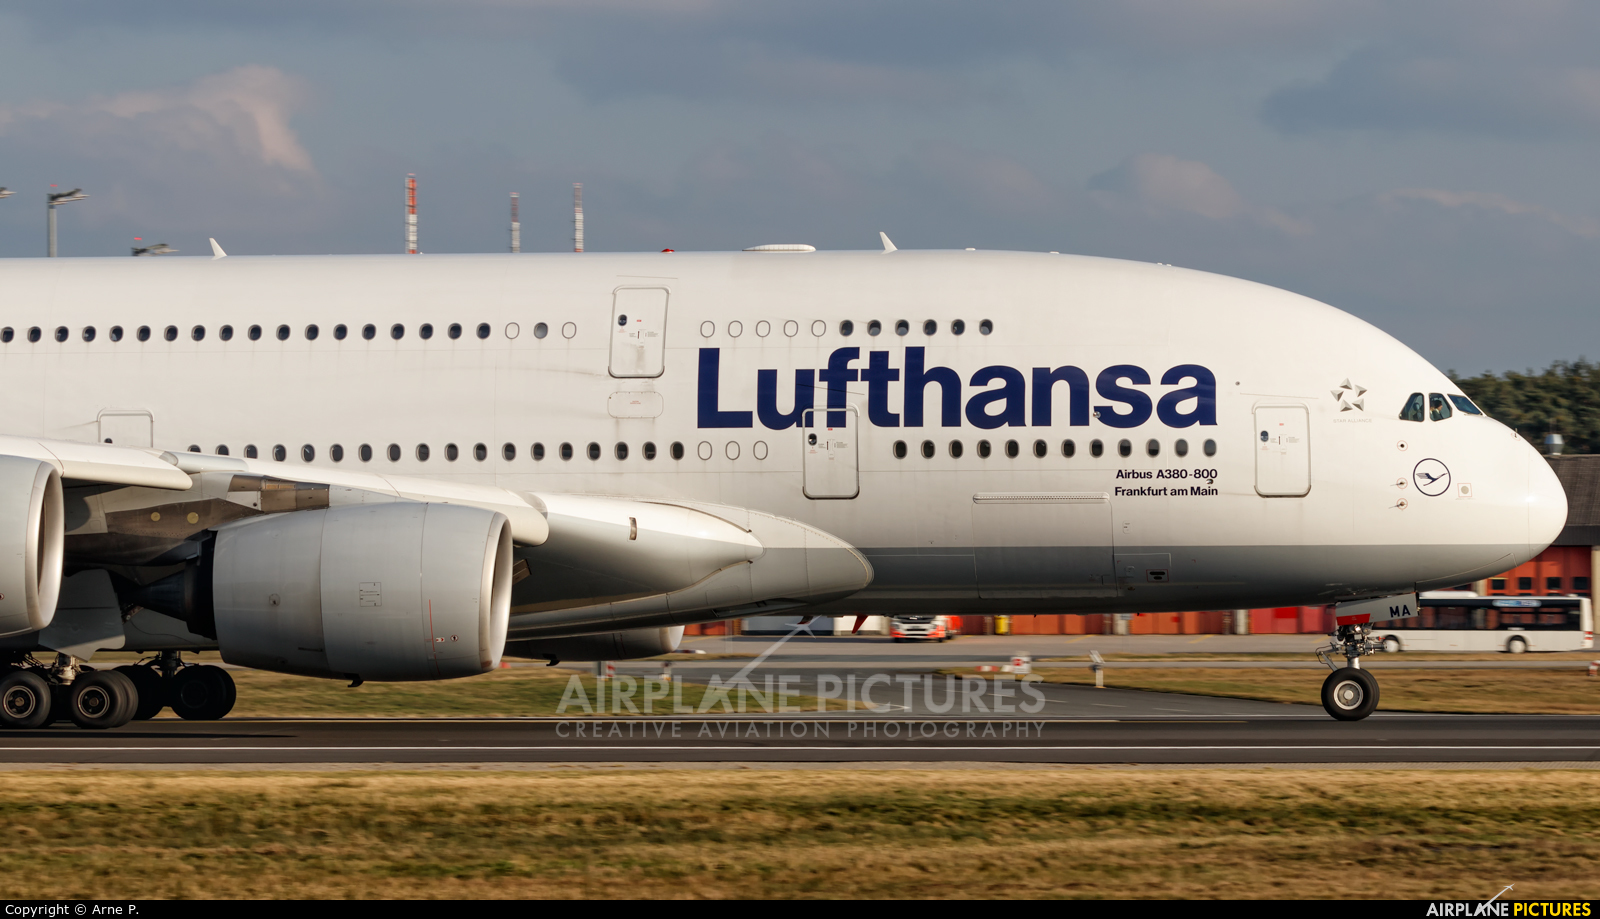 Lufthansa D-AIMA aircraft at Frankfurt